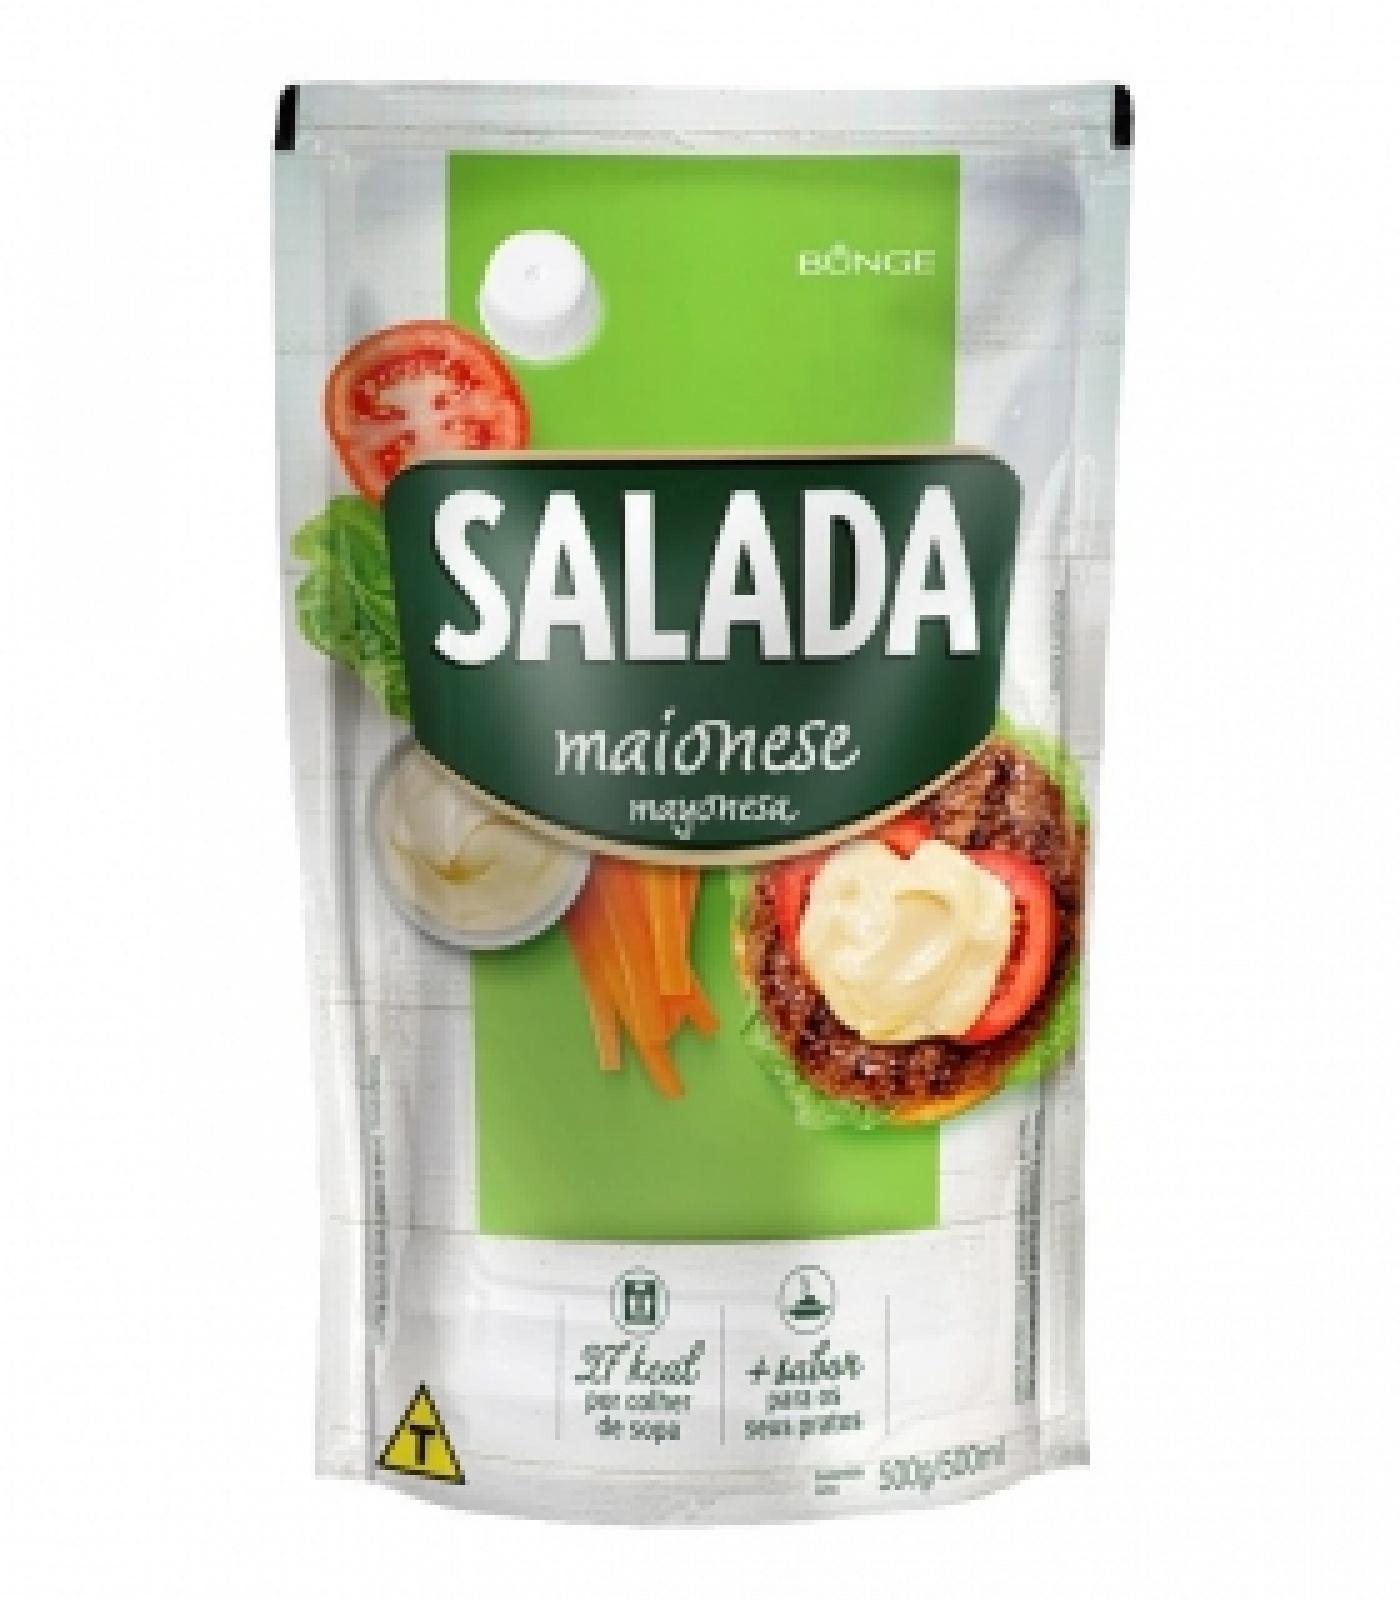 Maionese Salada Sache 500g